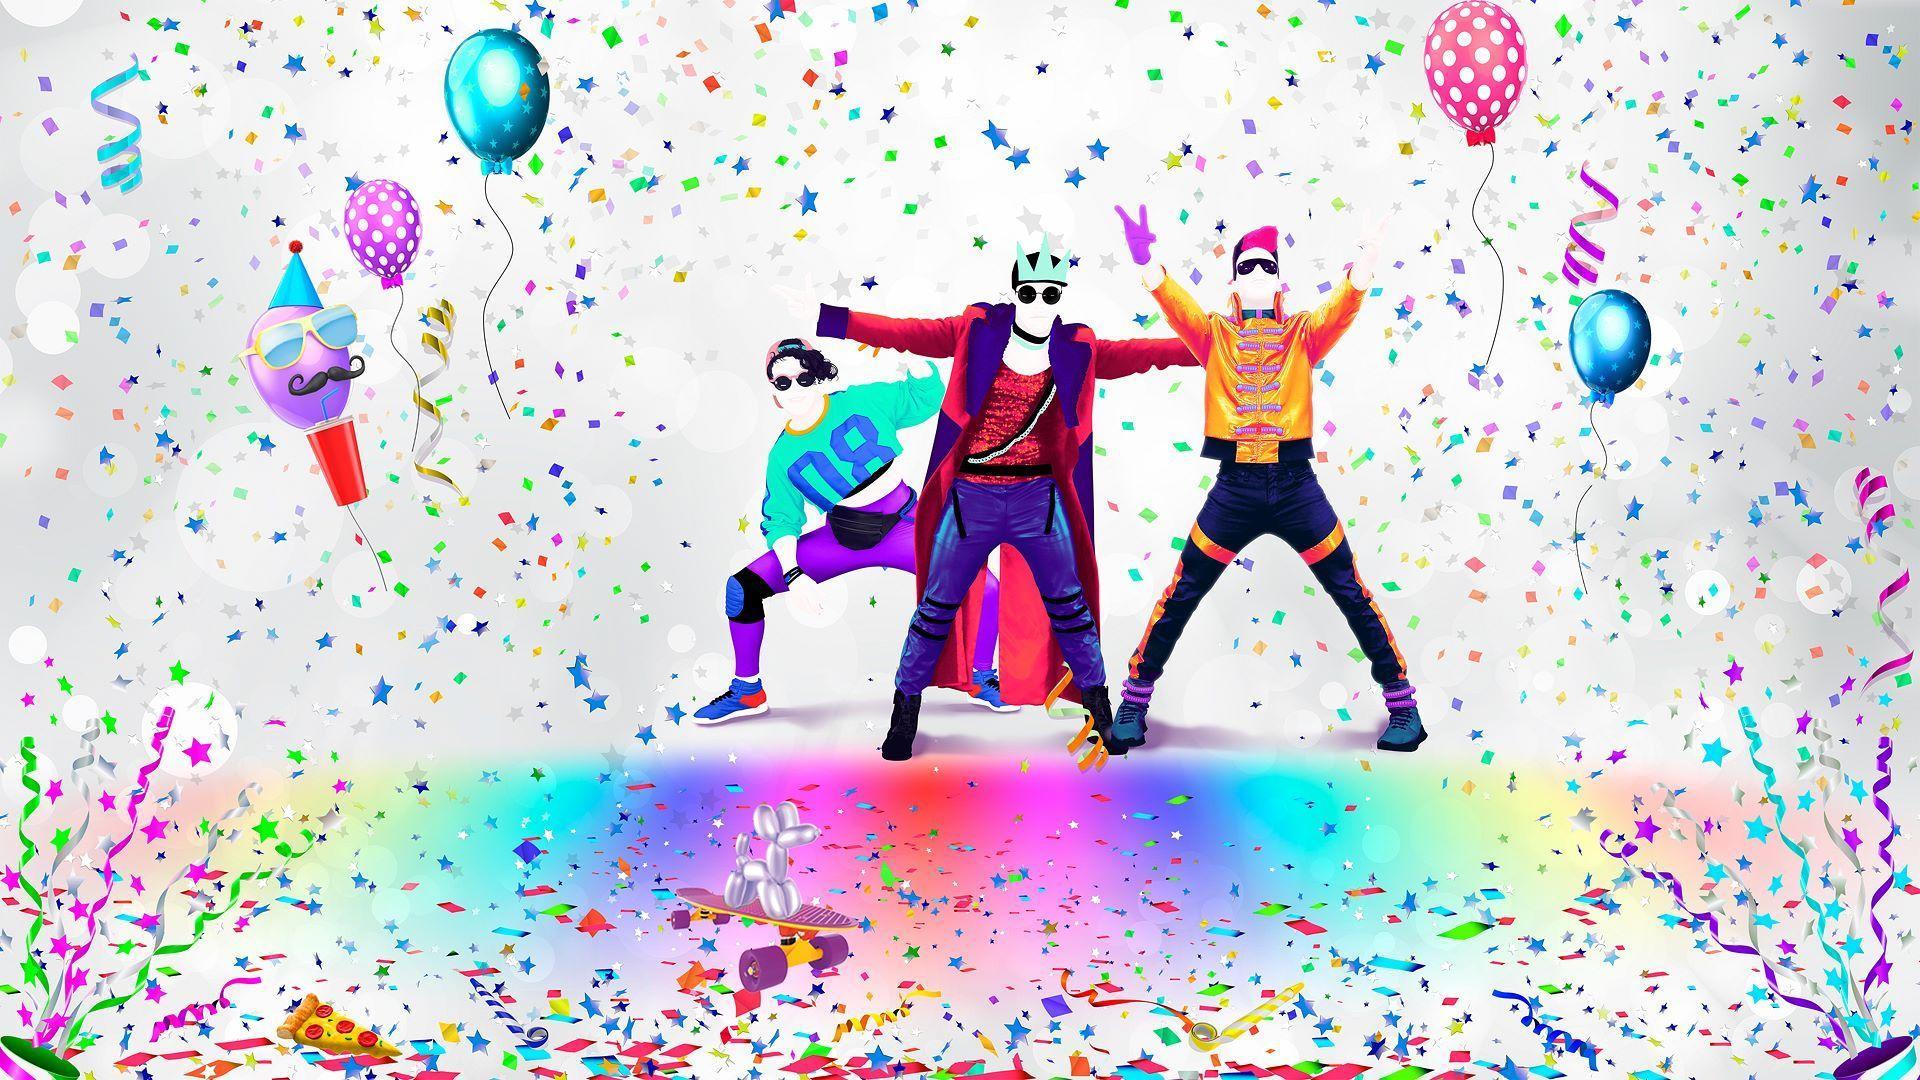 Just Dance 2020 Wallpapers 1920x1080